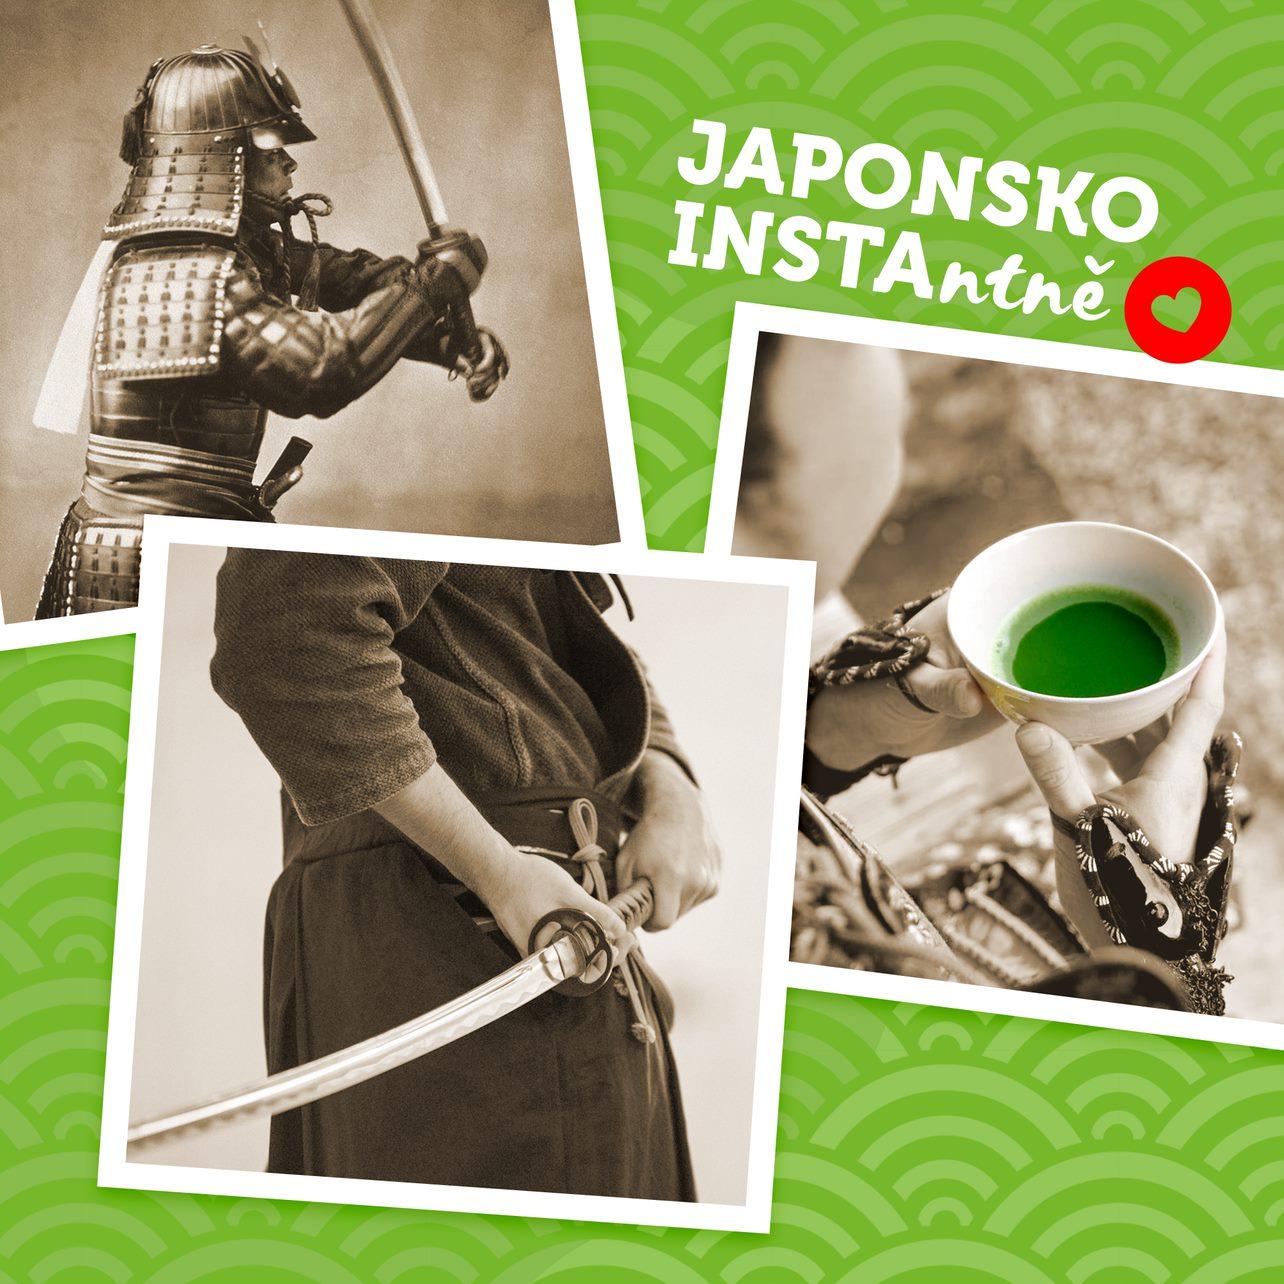 japonsko_instantne_8.jpeg